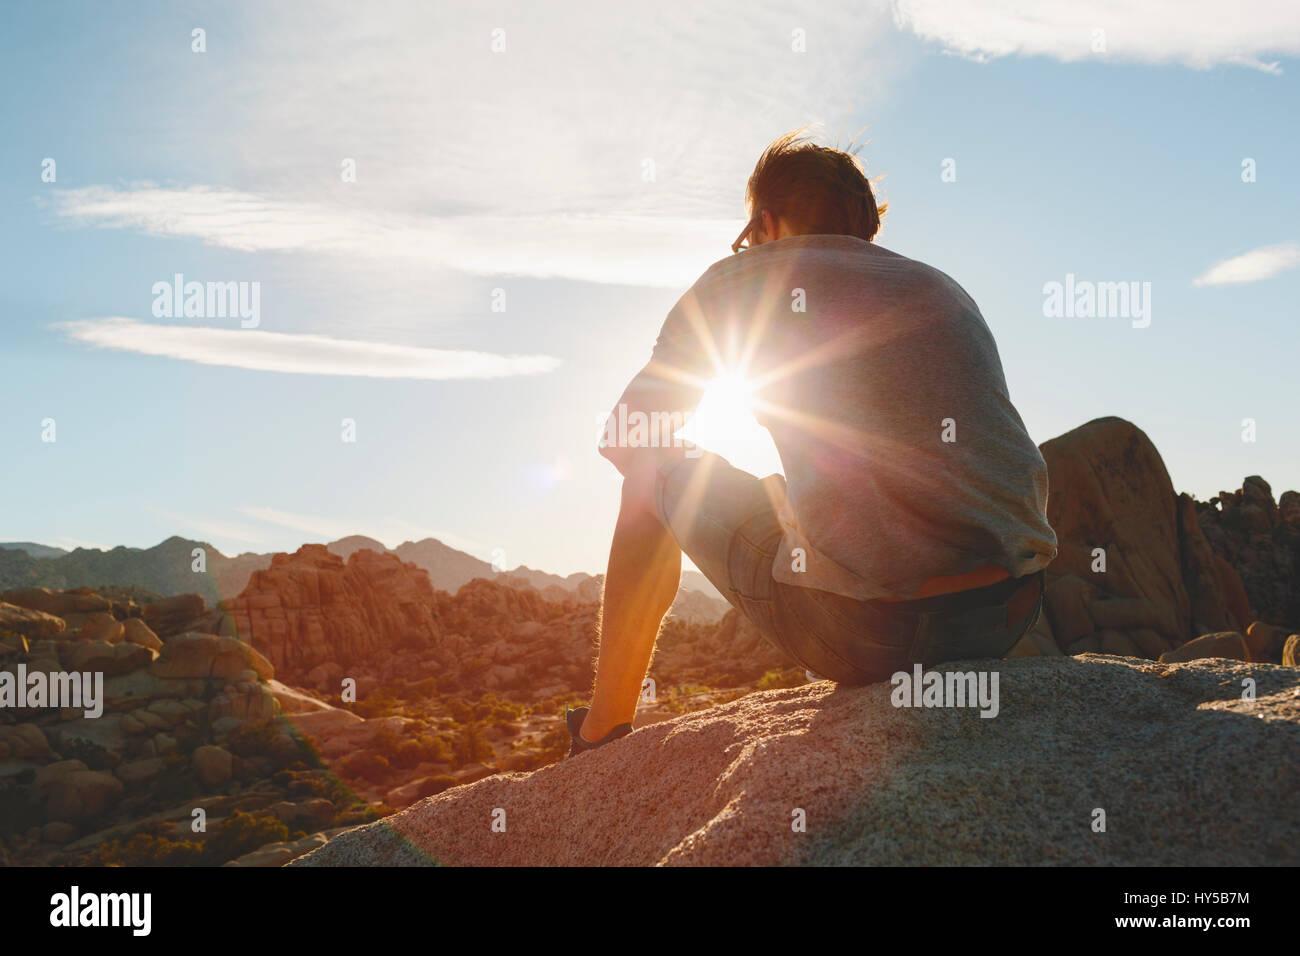 USA, California, Joshua Tree National Park, Man sitting on rock and watching sunset - Stock Image